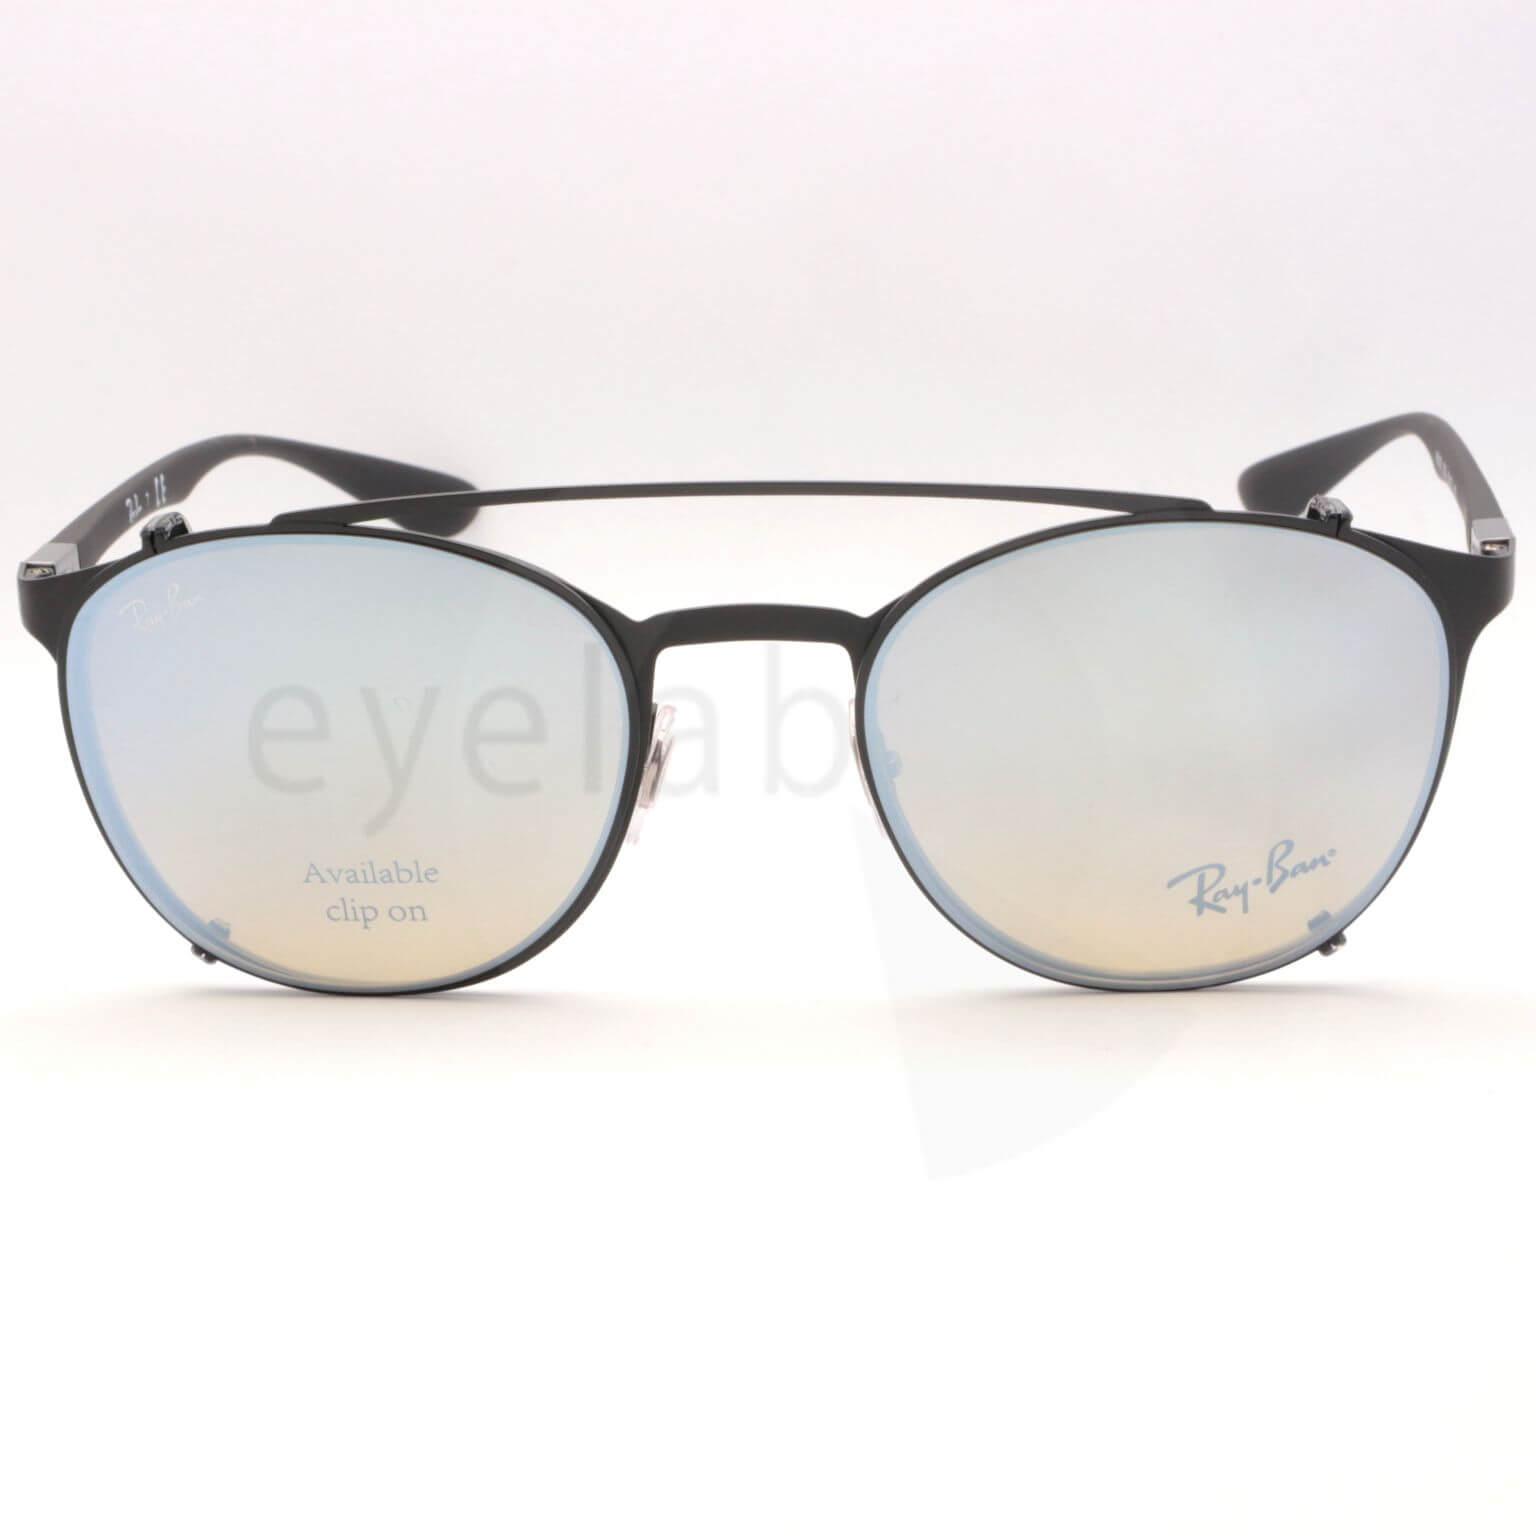 Clip-on Ray-Ban 6355C 2503B8 50 ~ Eyelab a92812b2d25